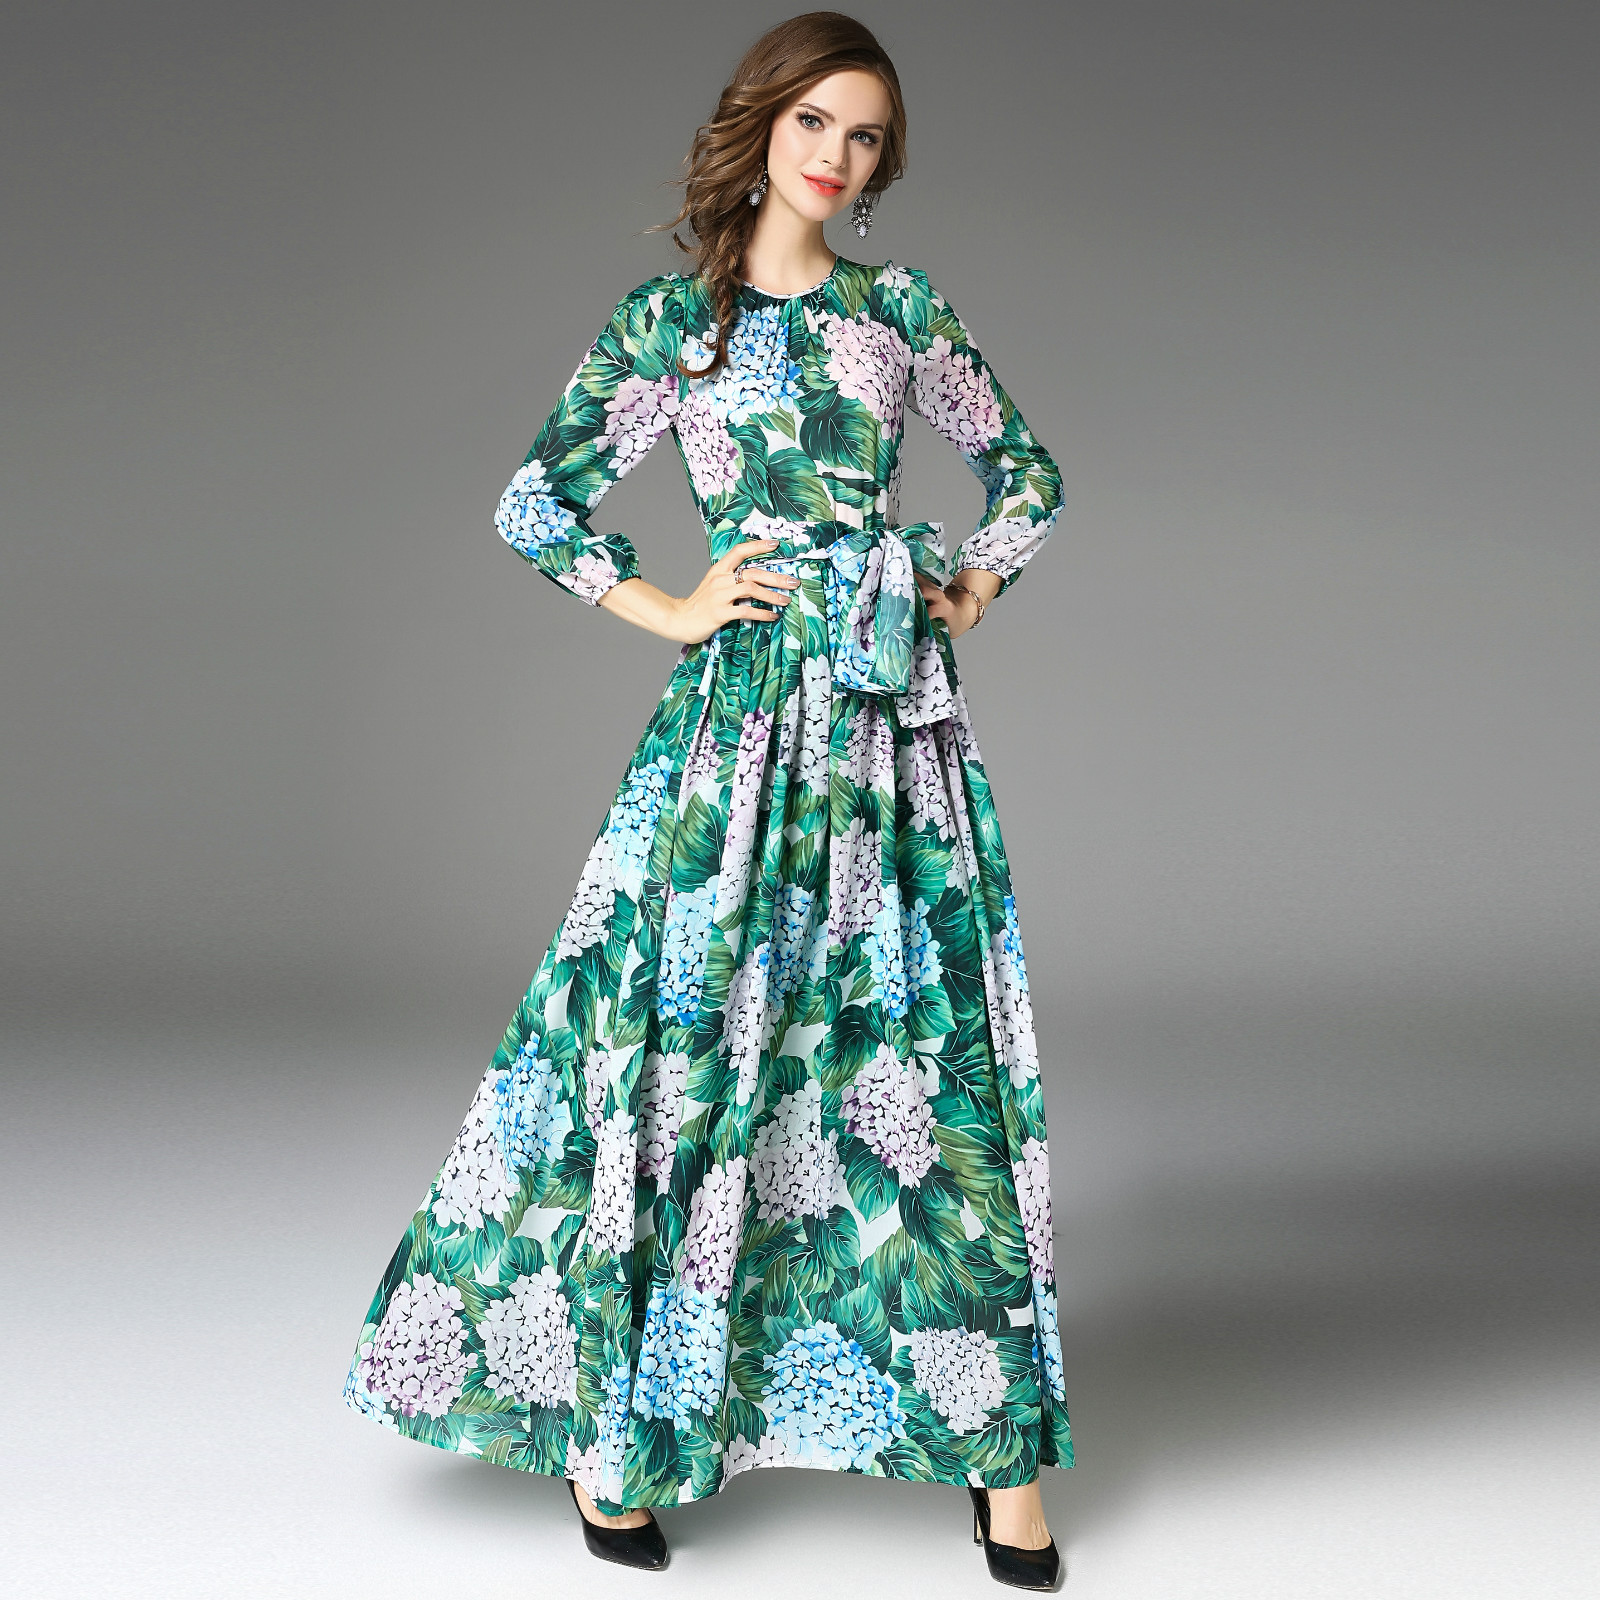 Böhmische Grüne Druck Lange Maxi Kleid Vestido Longo 2018 Herbst ...